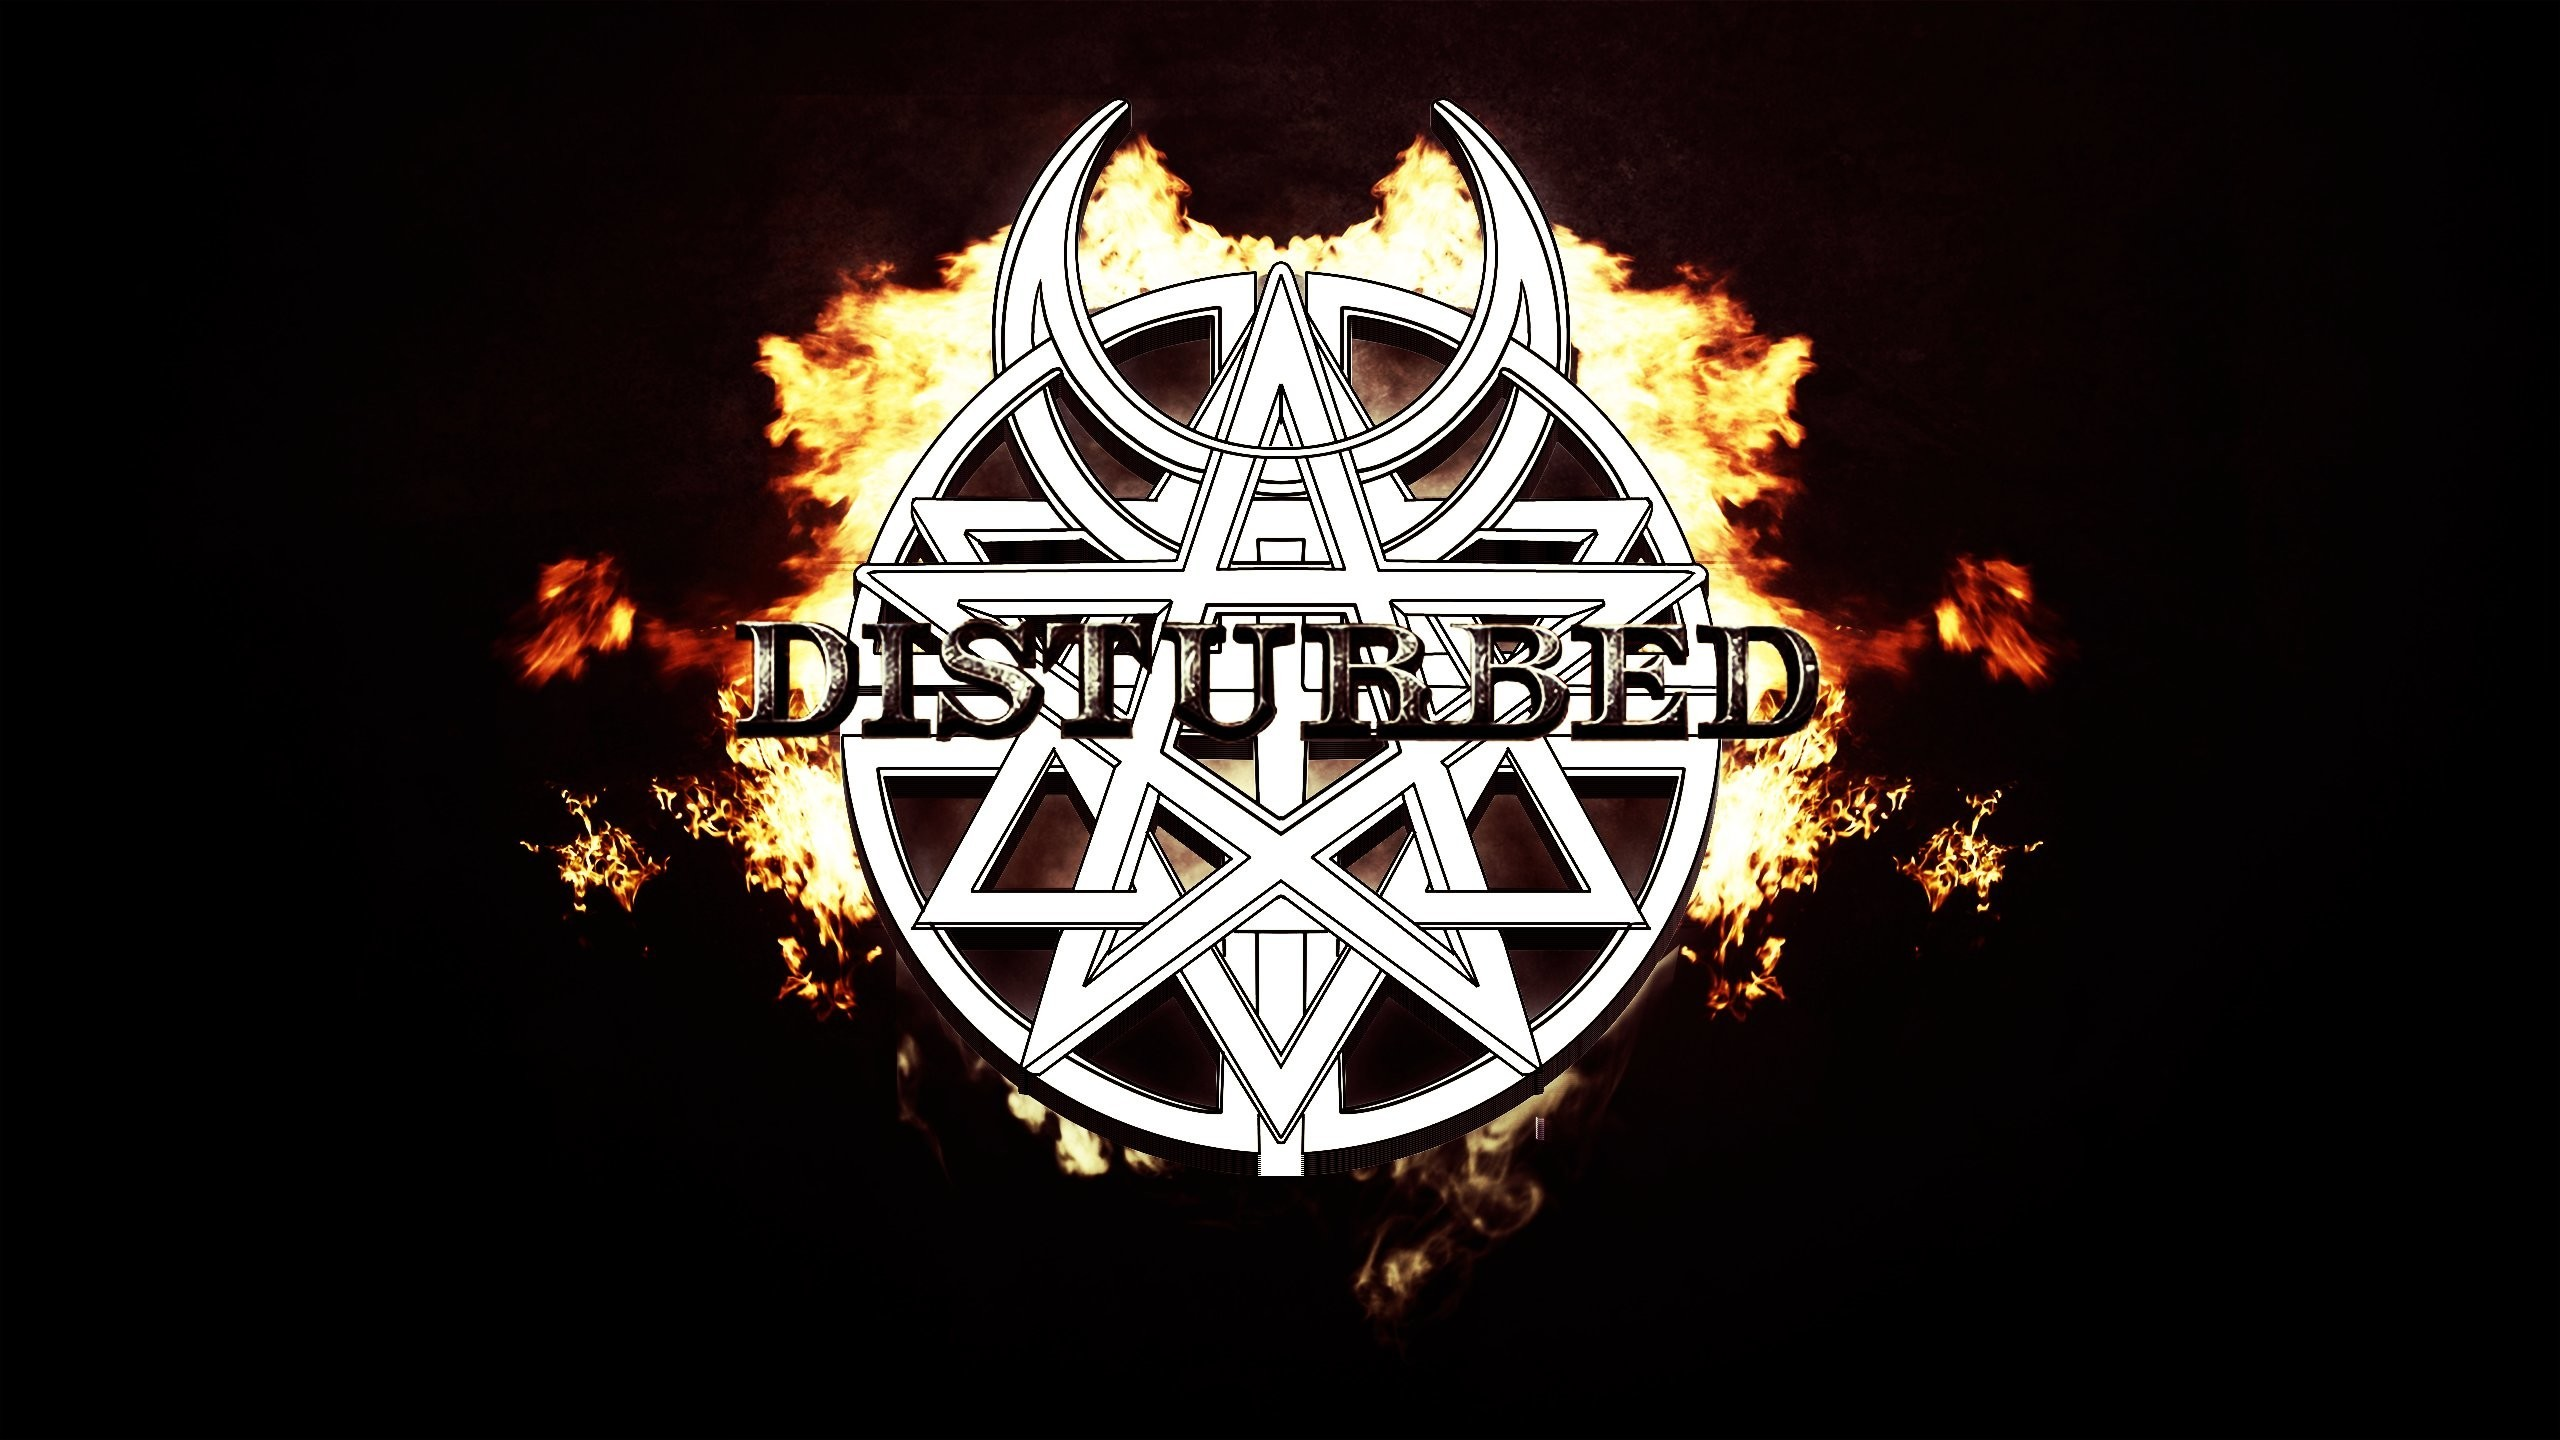 disturbed logo wallpaper - HD1600×1200